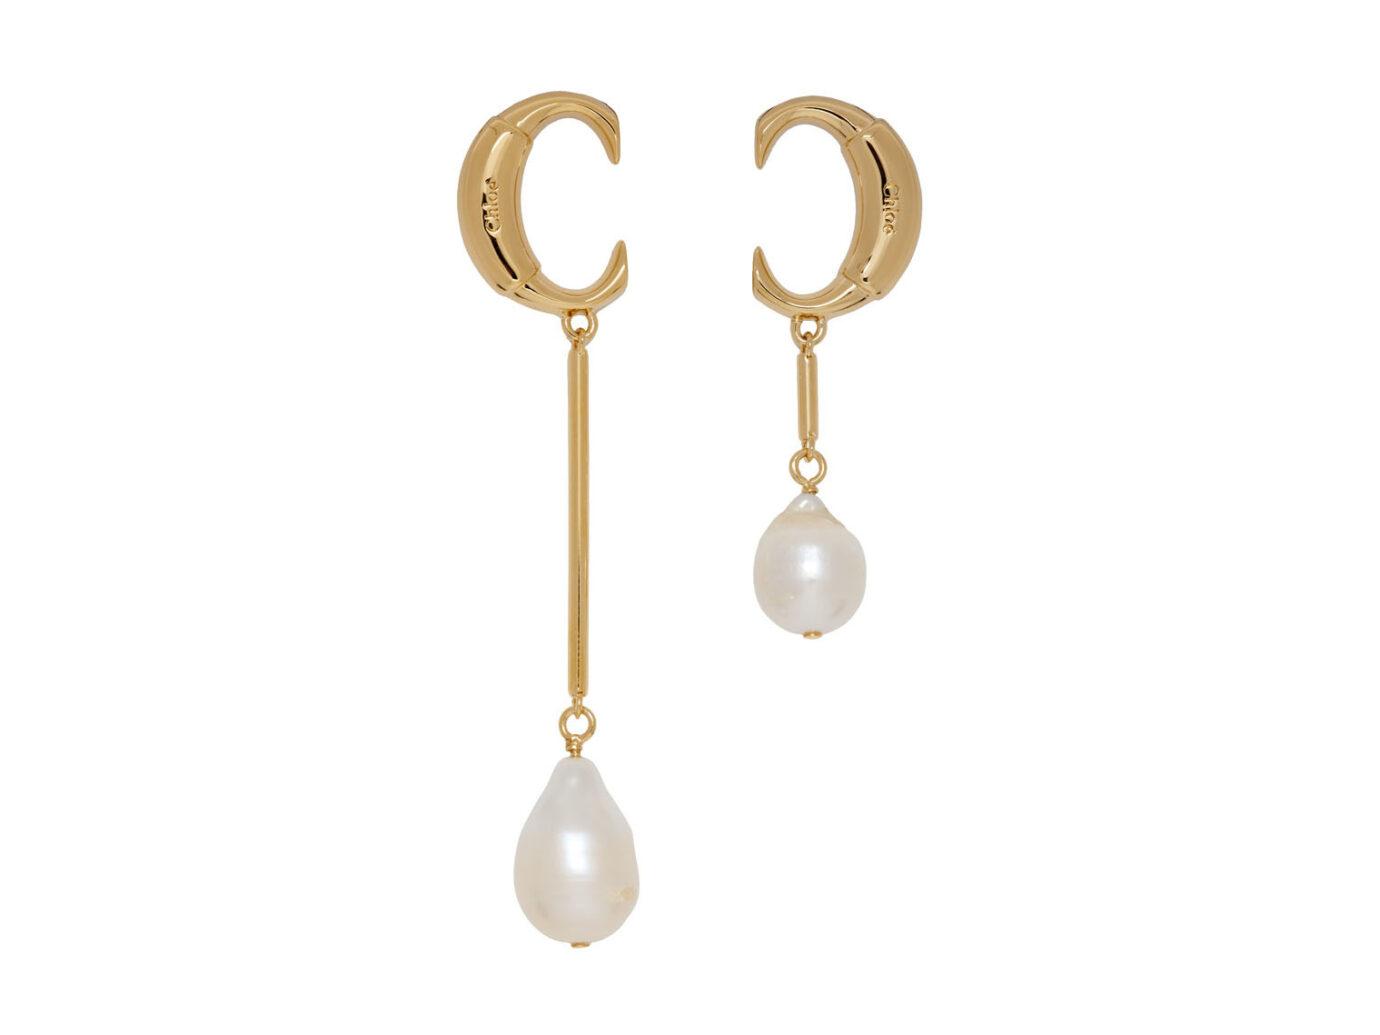 Chloé Gold 'Chloé C' Pearl Earrings